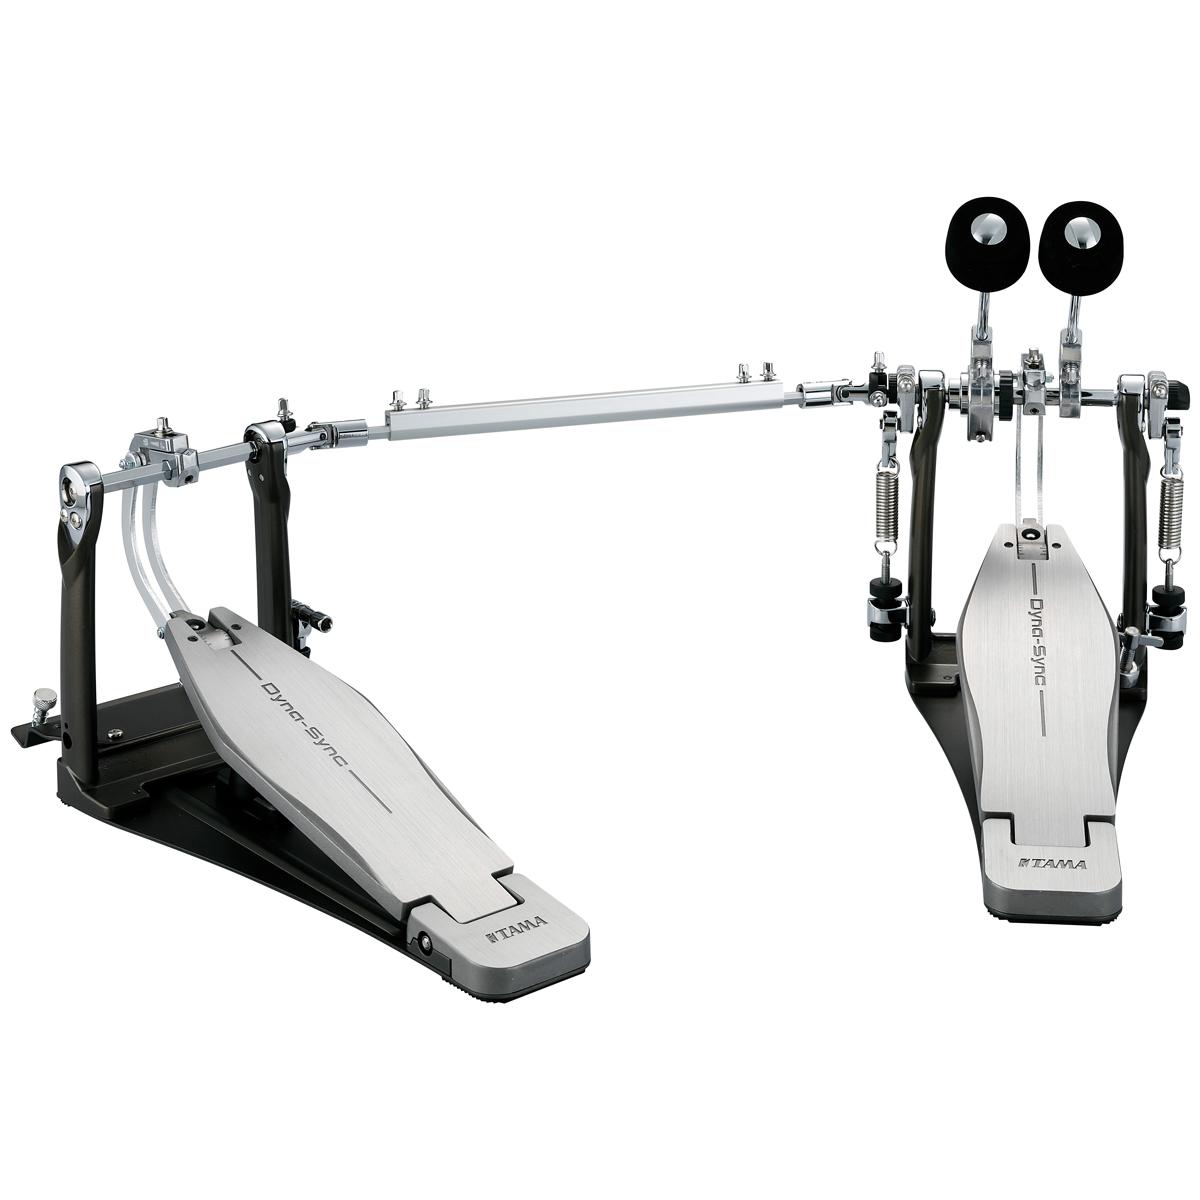 TAMA / HPDS1TW タマ Dyna-Sync Drum Pedal ツインペダル ダイレクトドライブ